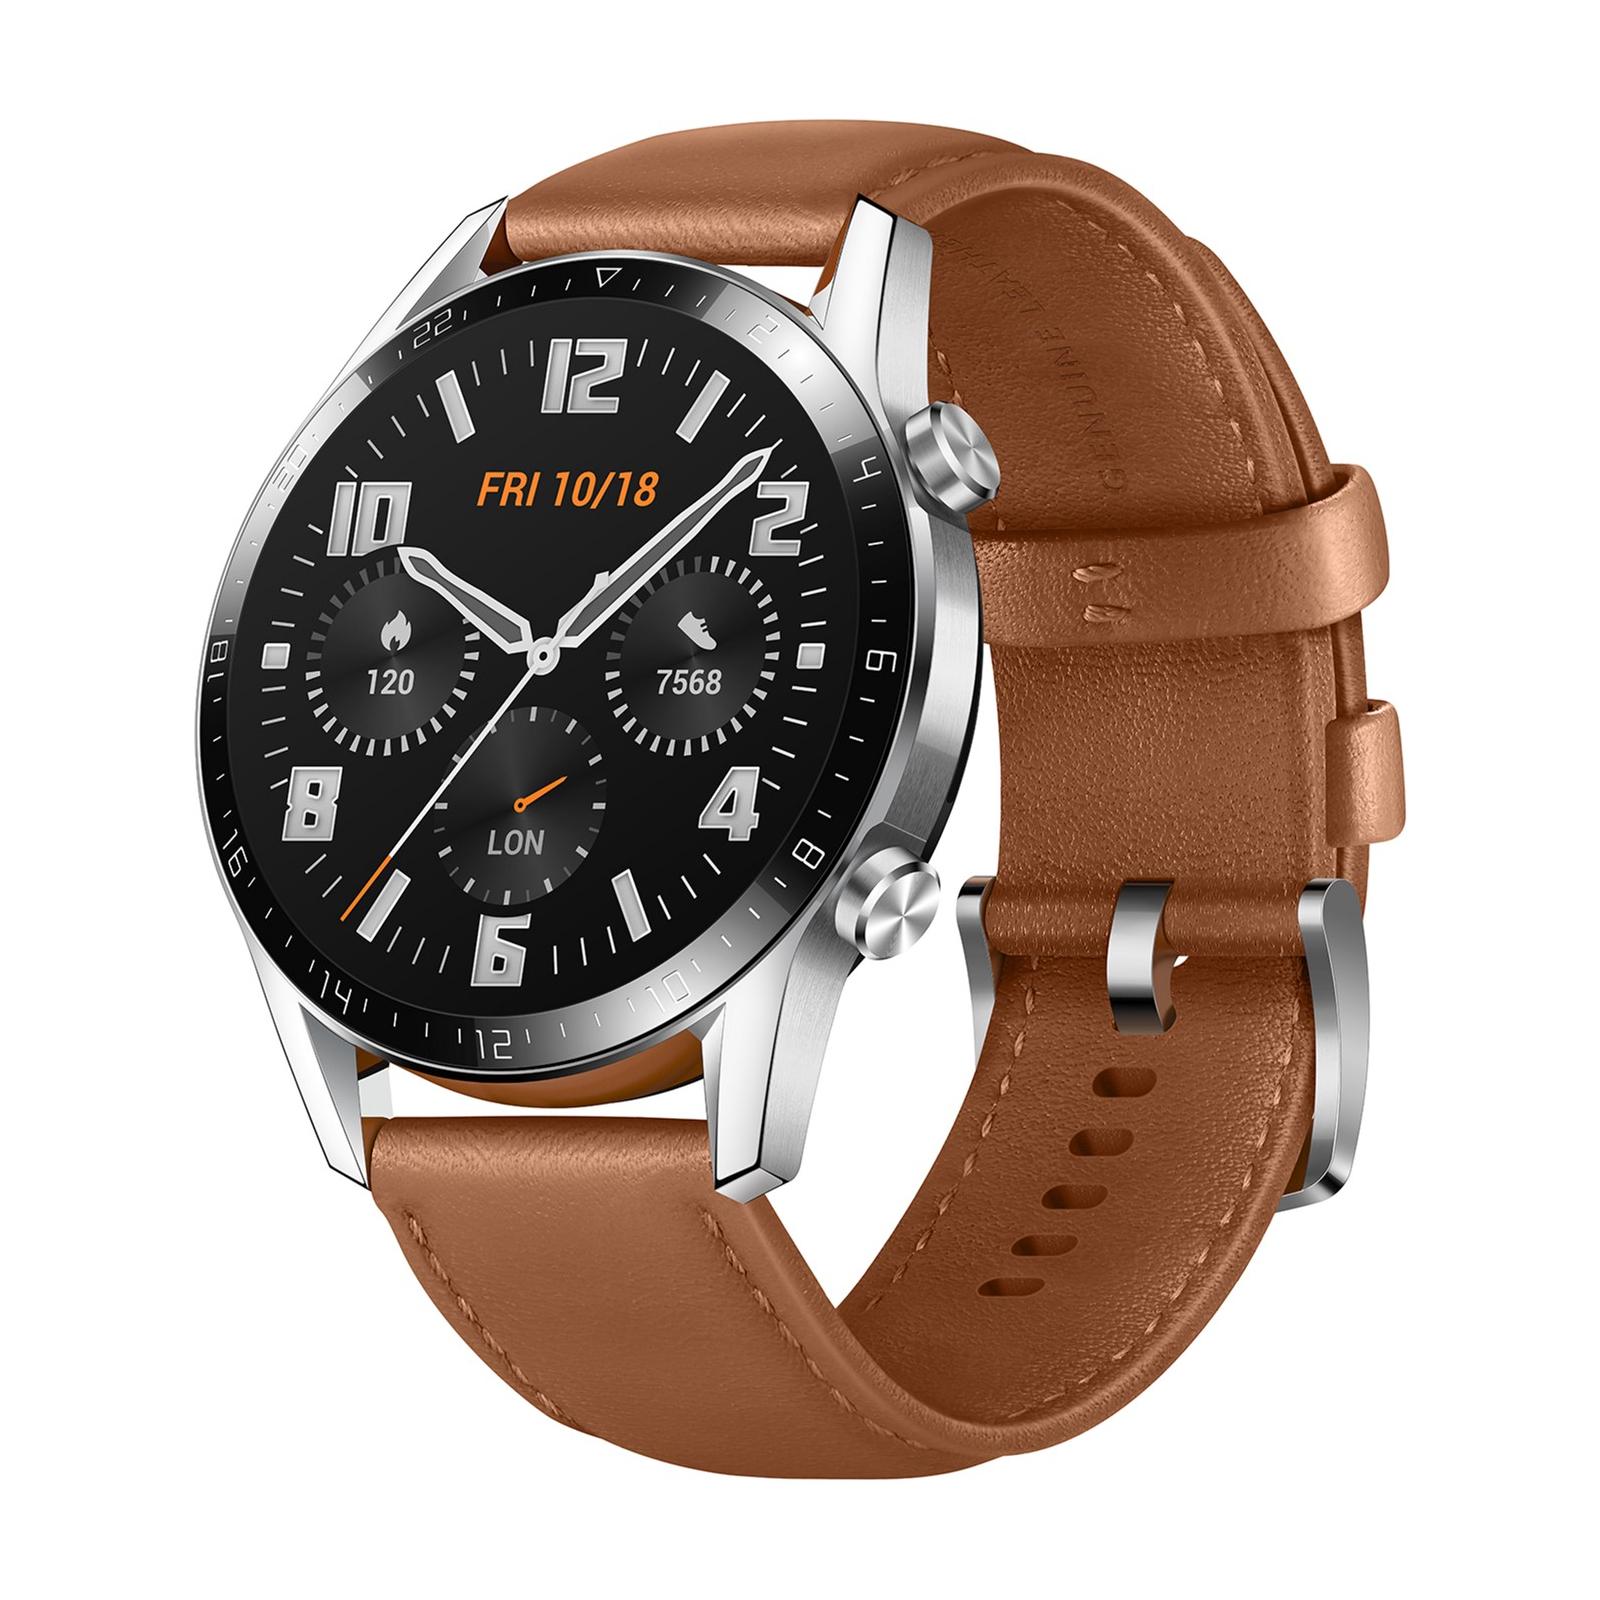 Смарт-часы Huawei Watch GT 2 46mm Classic Silver BROWN шкіра (Latona-B19V) (55024470) изображение 3